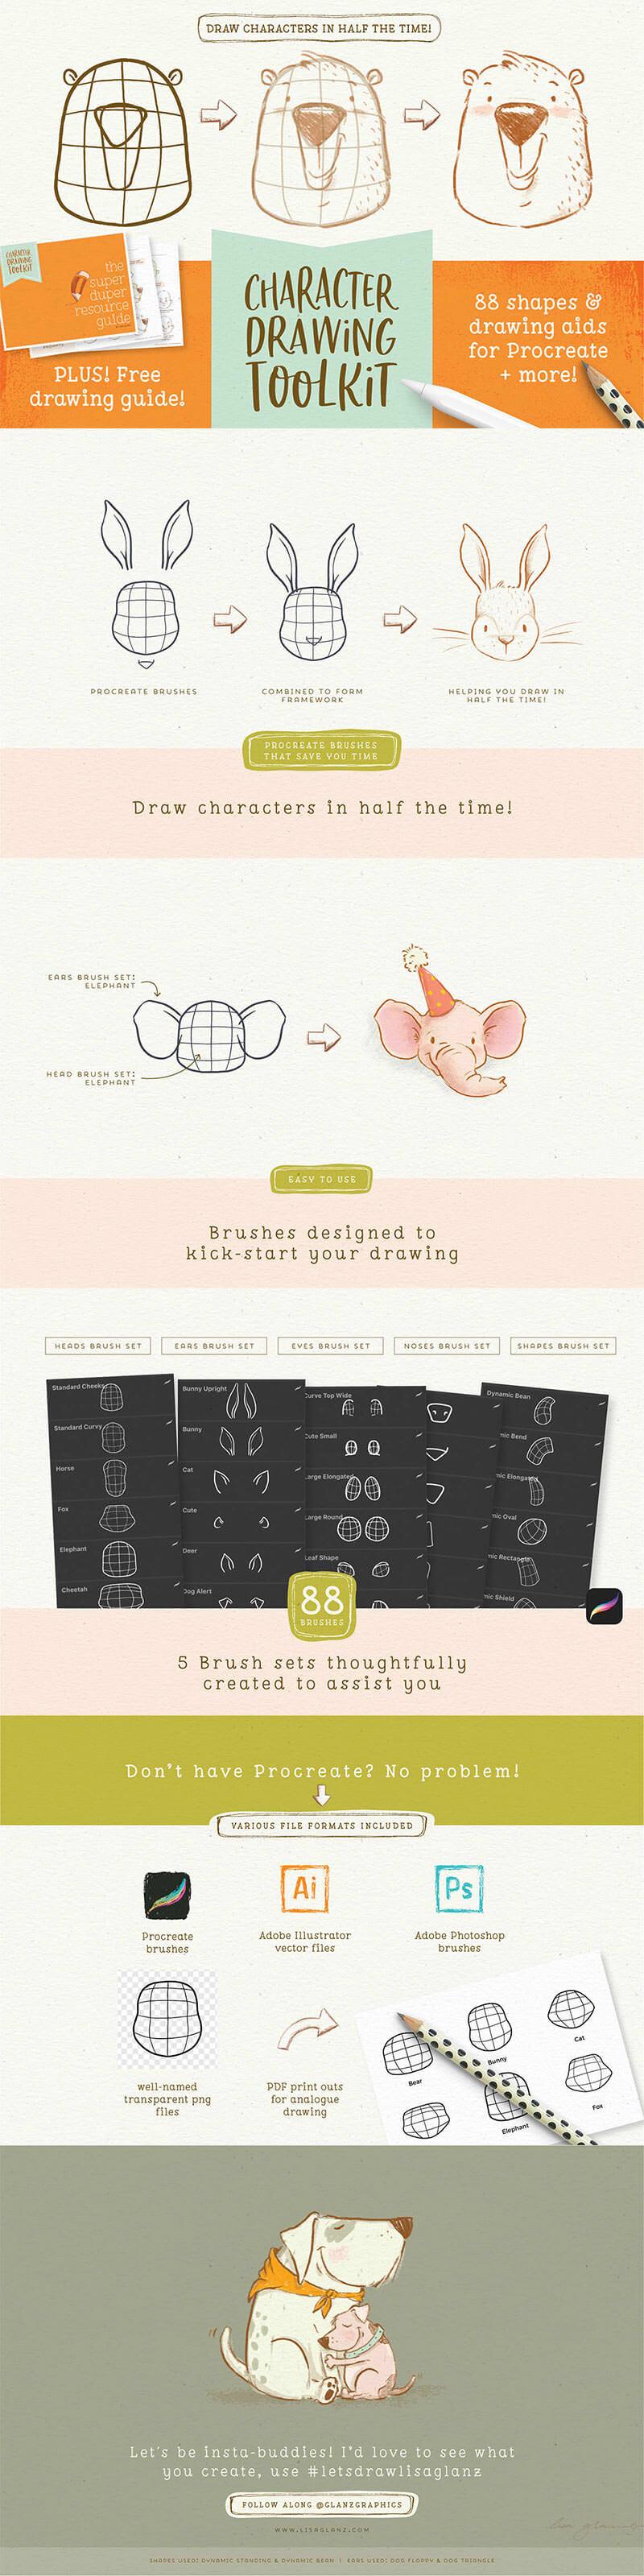 digital-designers-essential-library-a-1